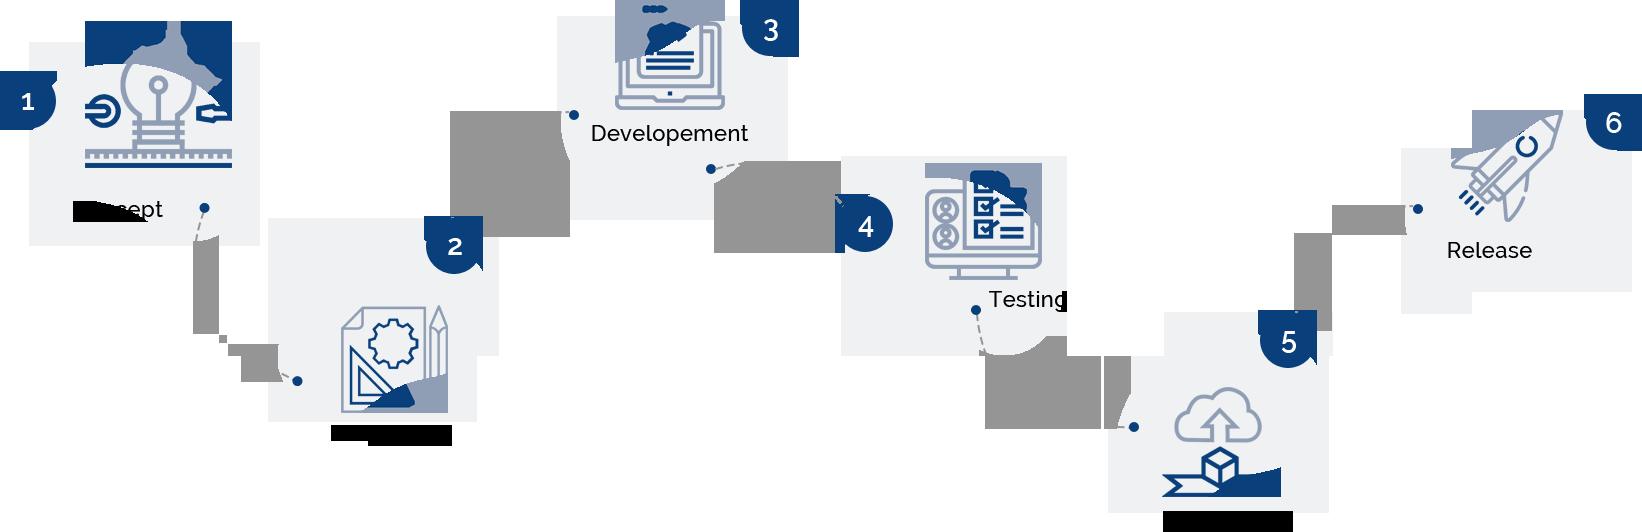 Illustration of mobile app development process